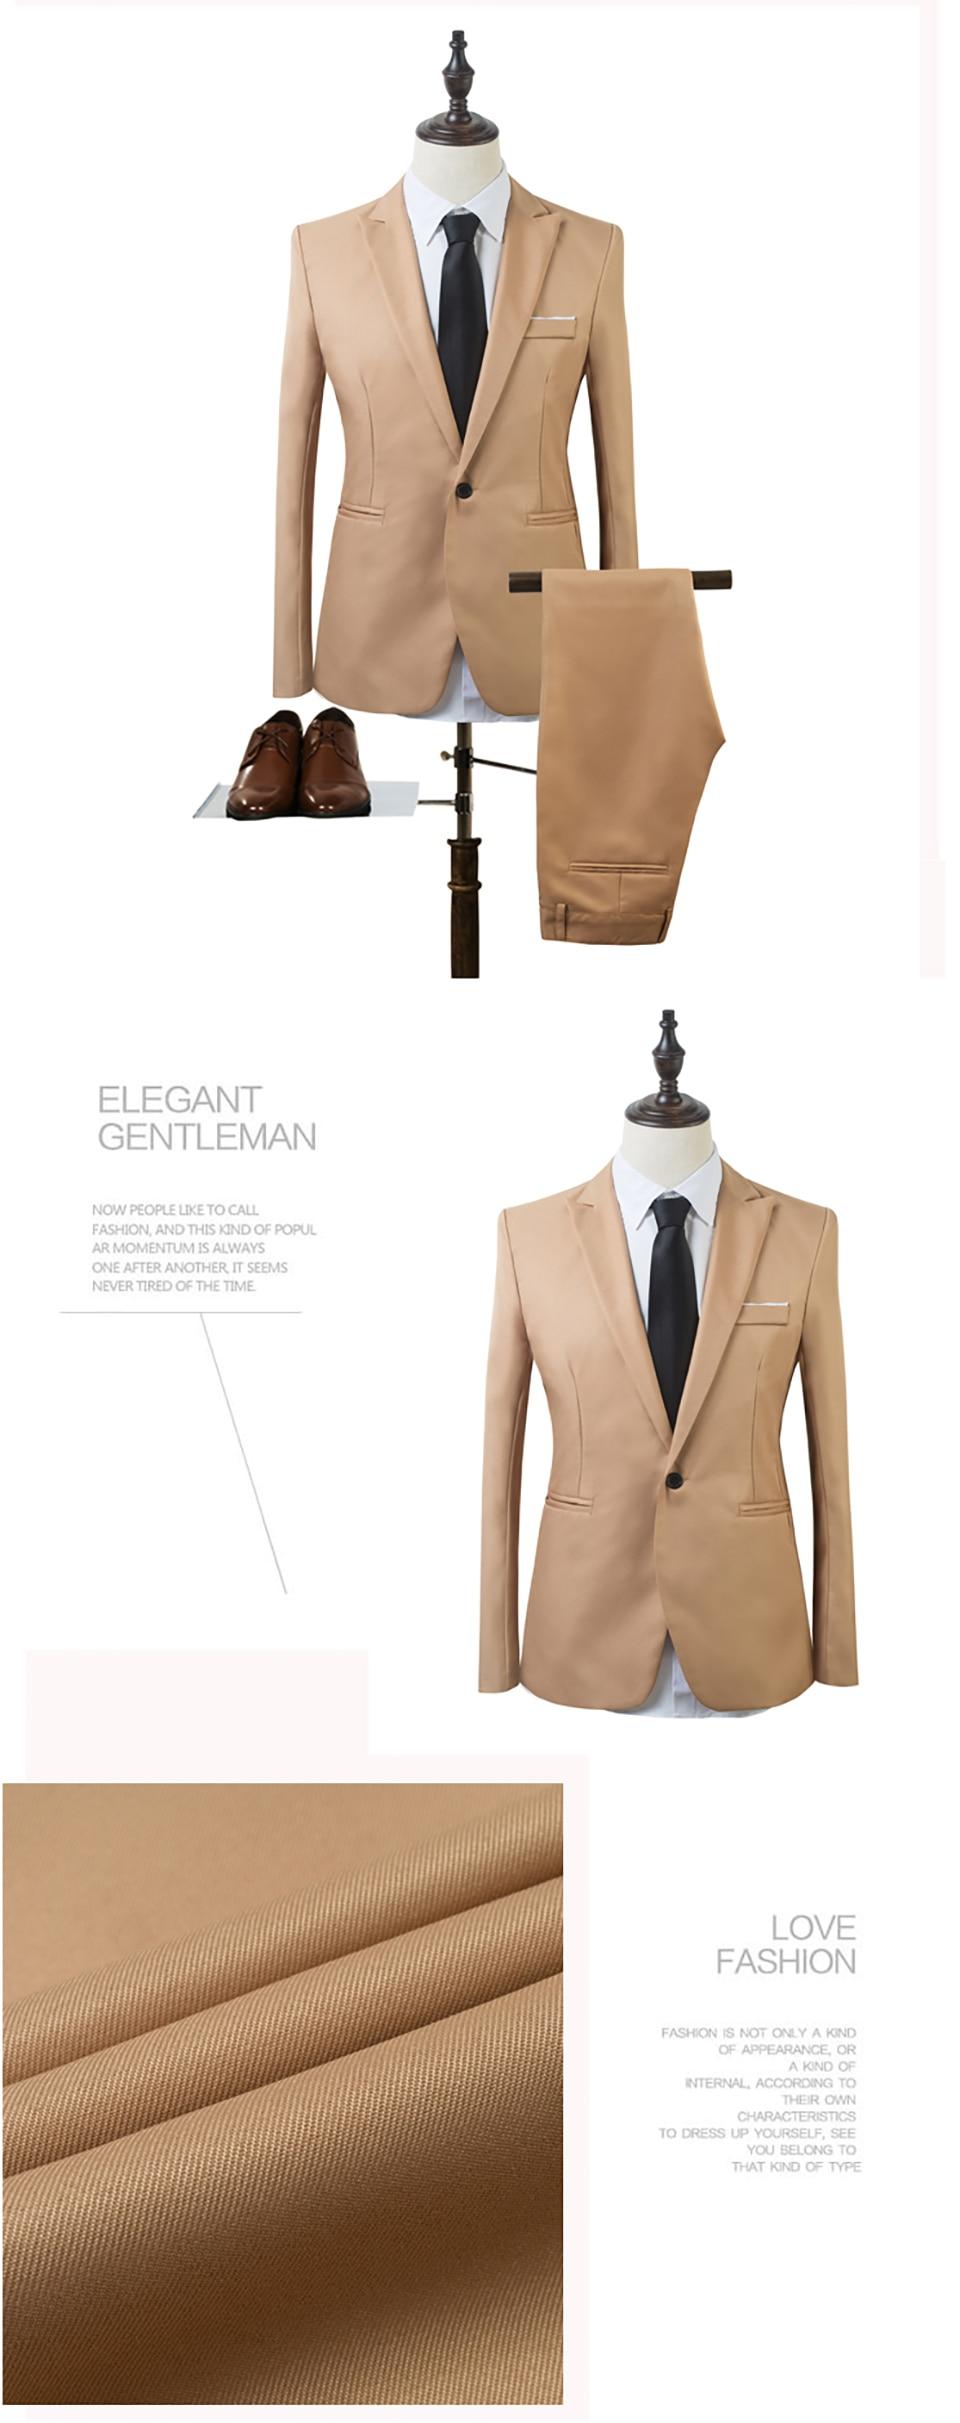 Luxury-Men-Wedding-Suit-Male-Blazers-Slim-Fit-Suits-For-Men-Costume-Business-(7)